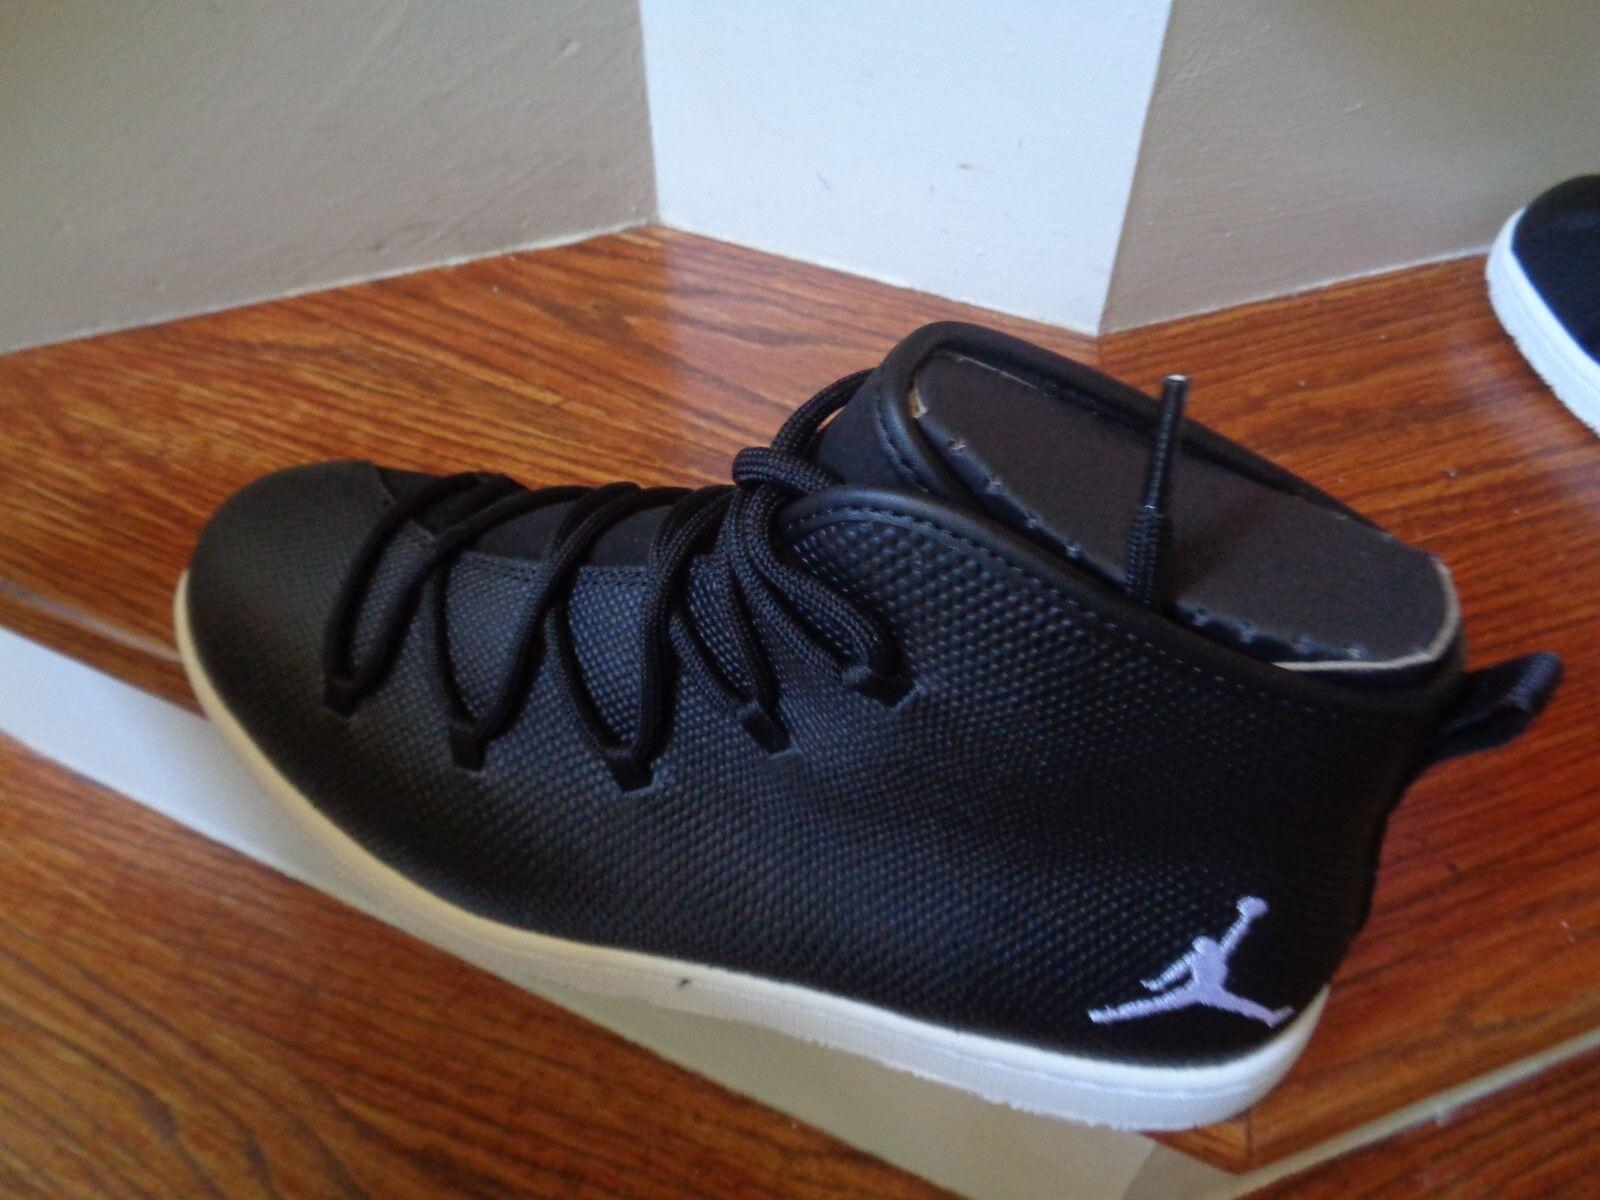 7dfc2a6ecbdc38 Nike Air Jordan Galaxy Men s Basketball shoes